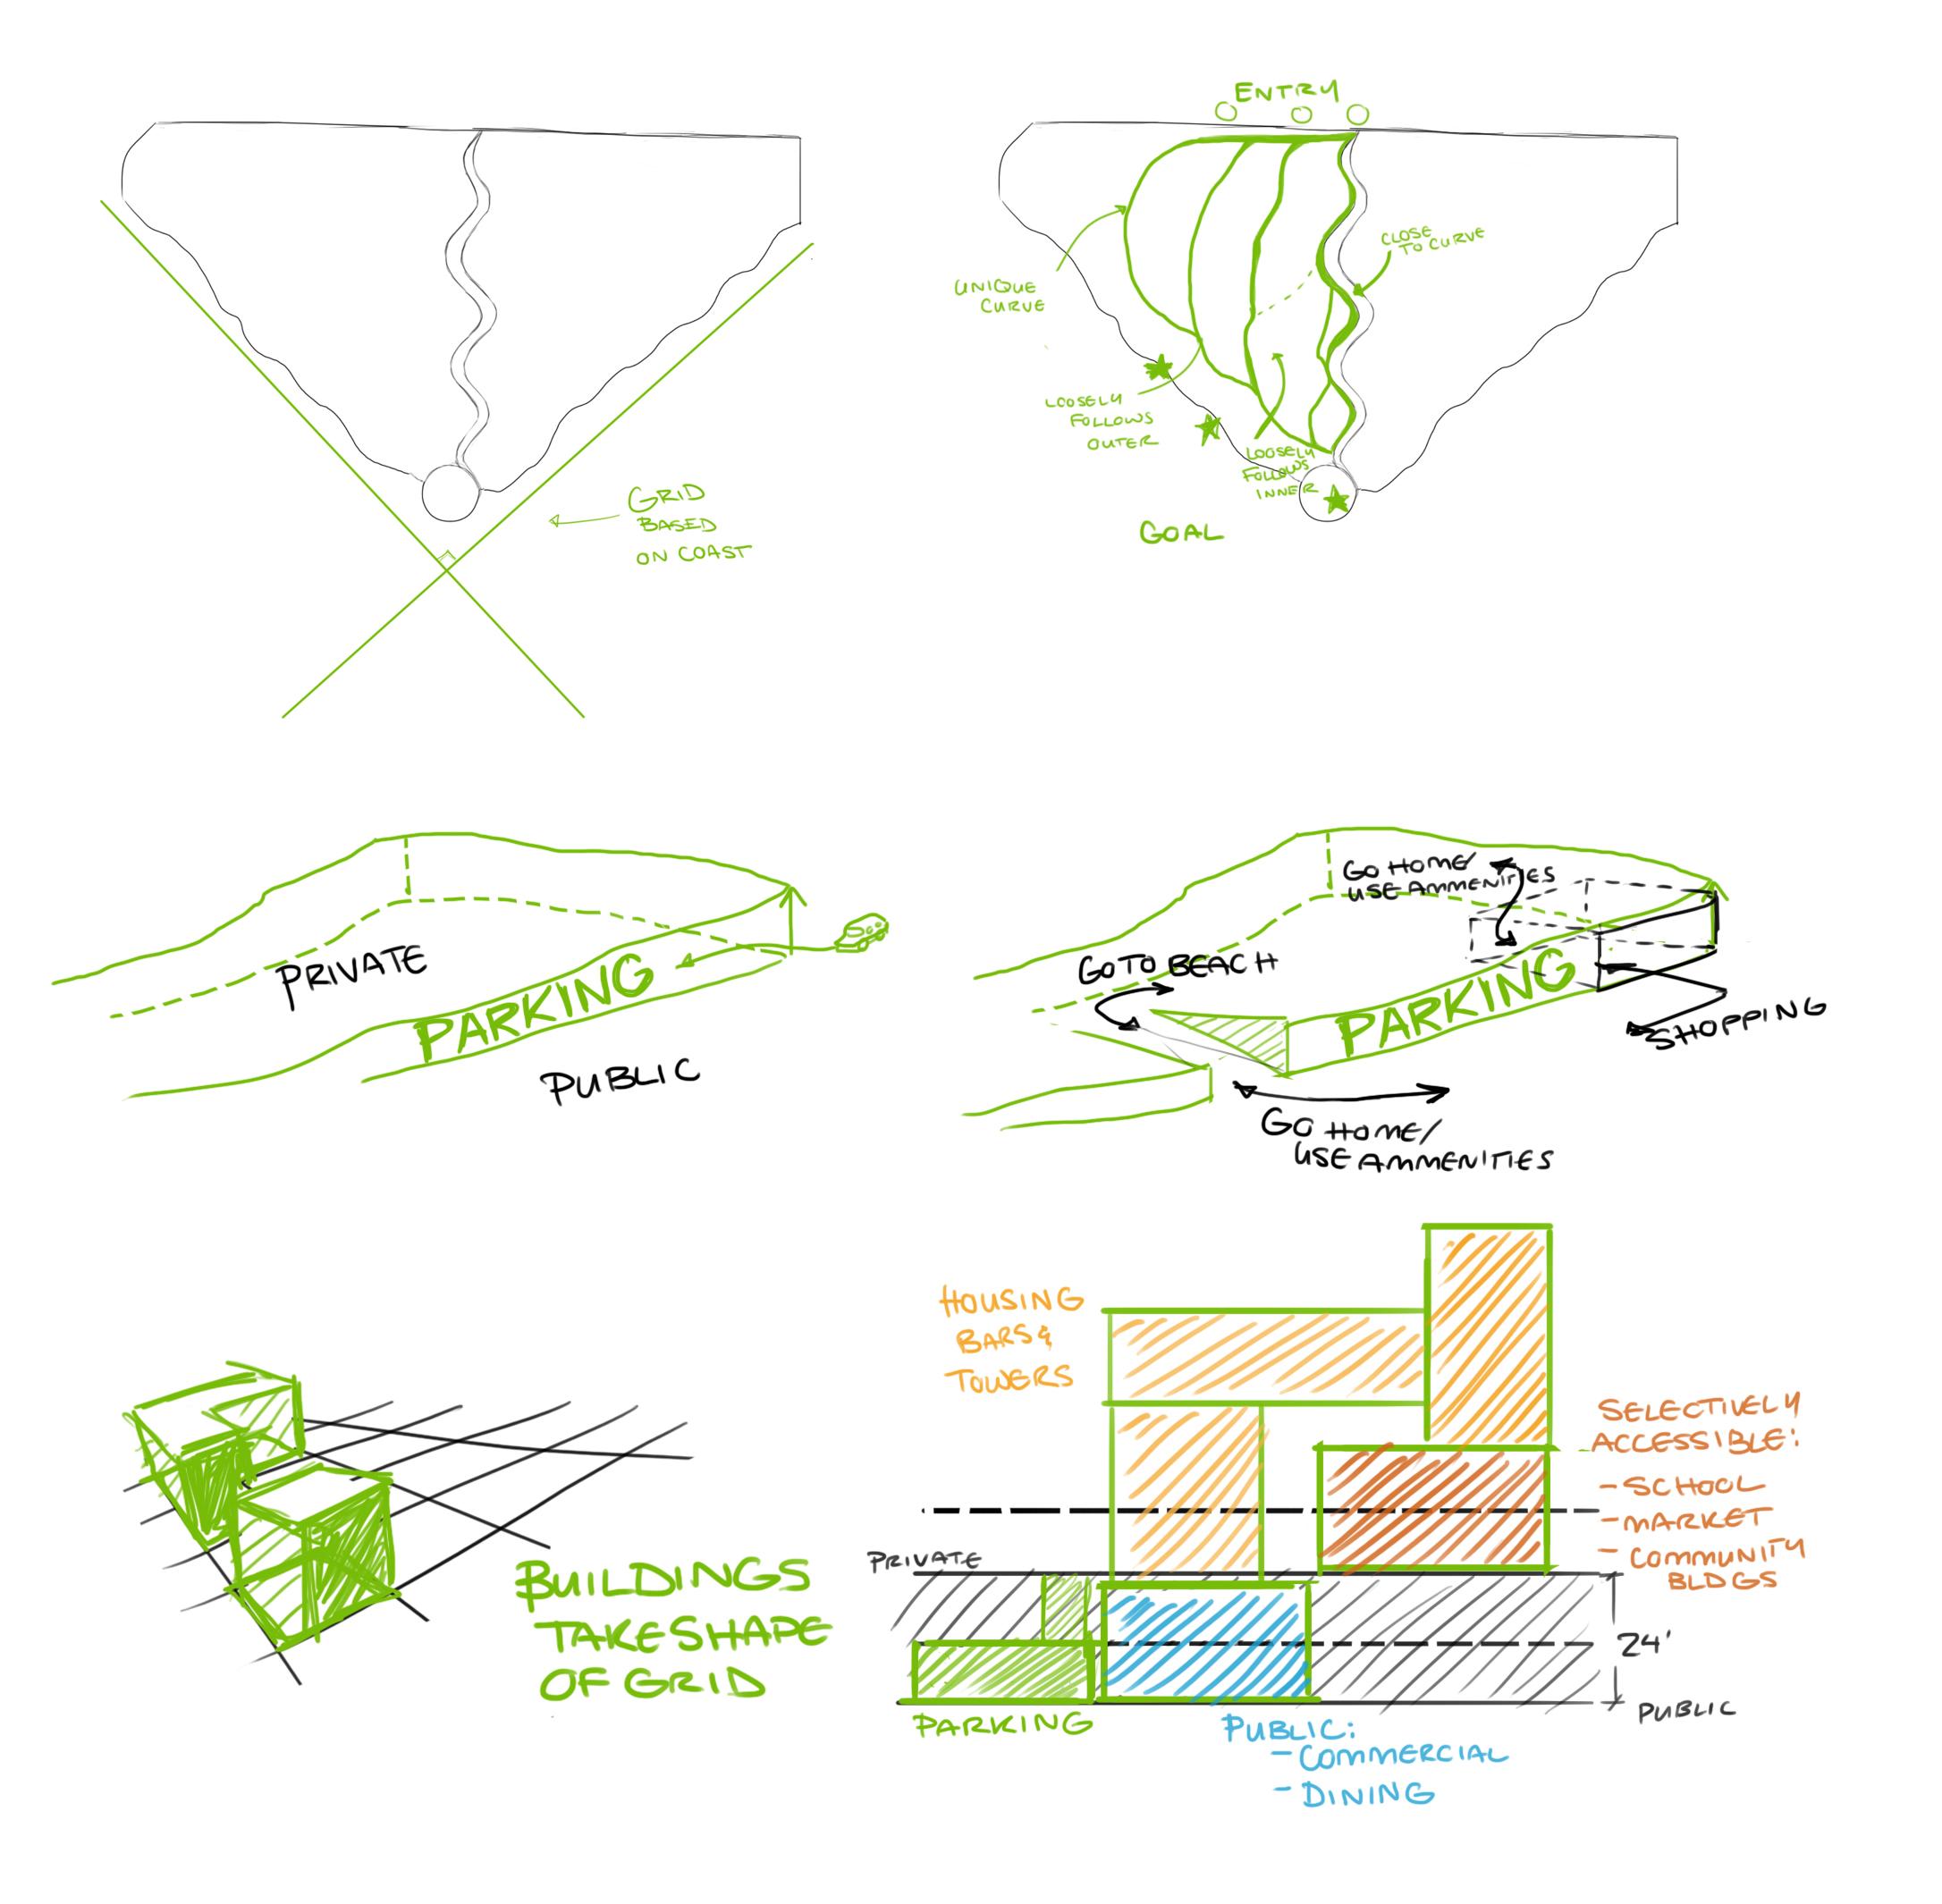 diagramsAll.jpg